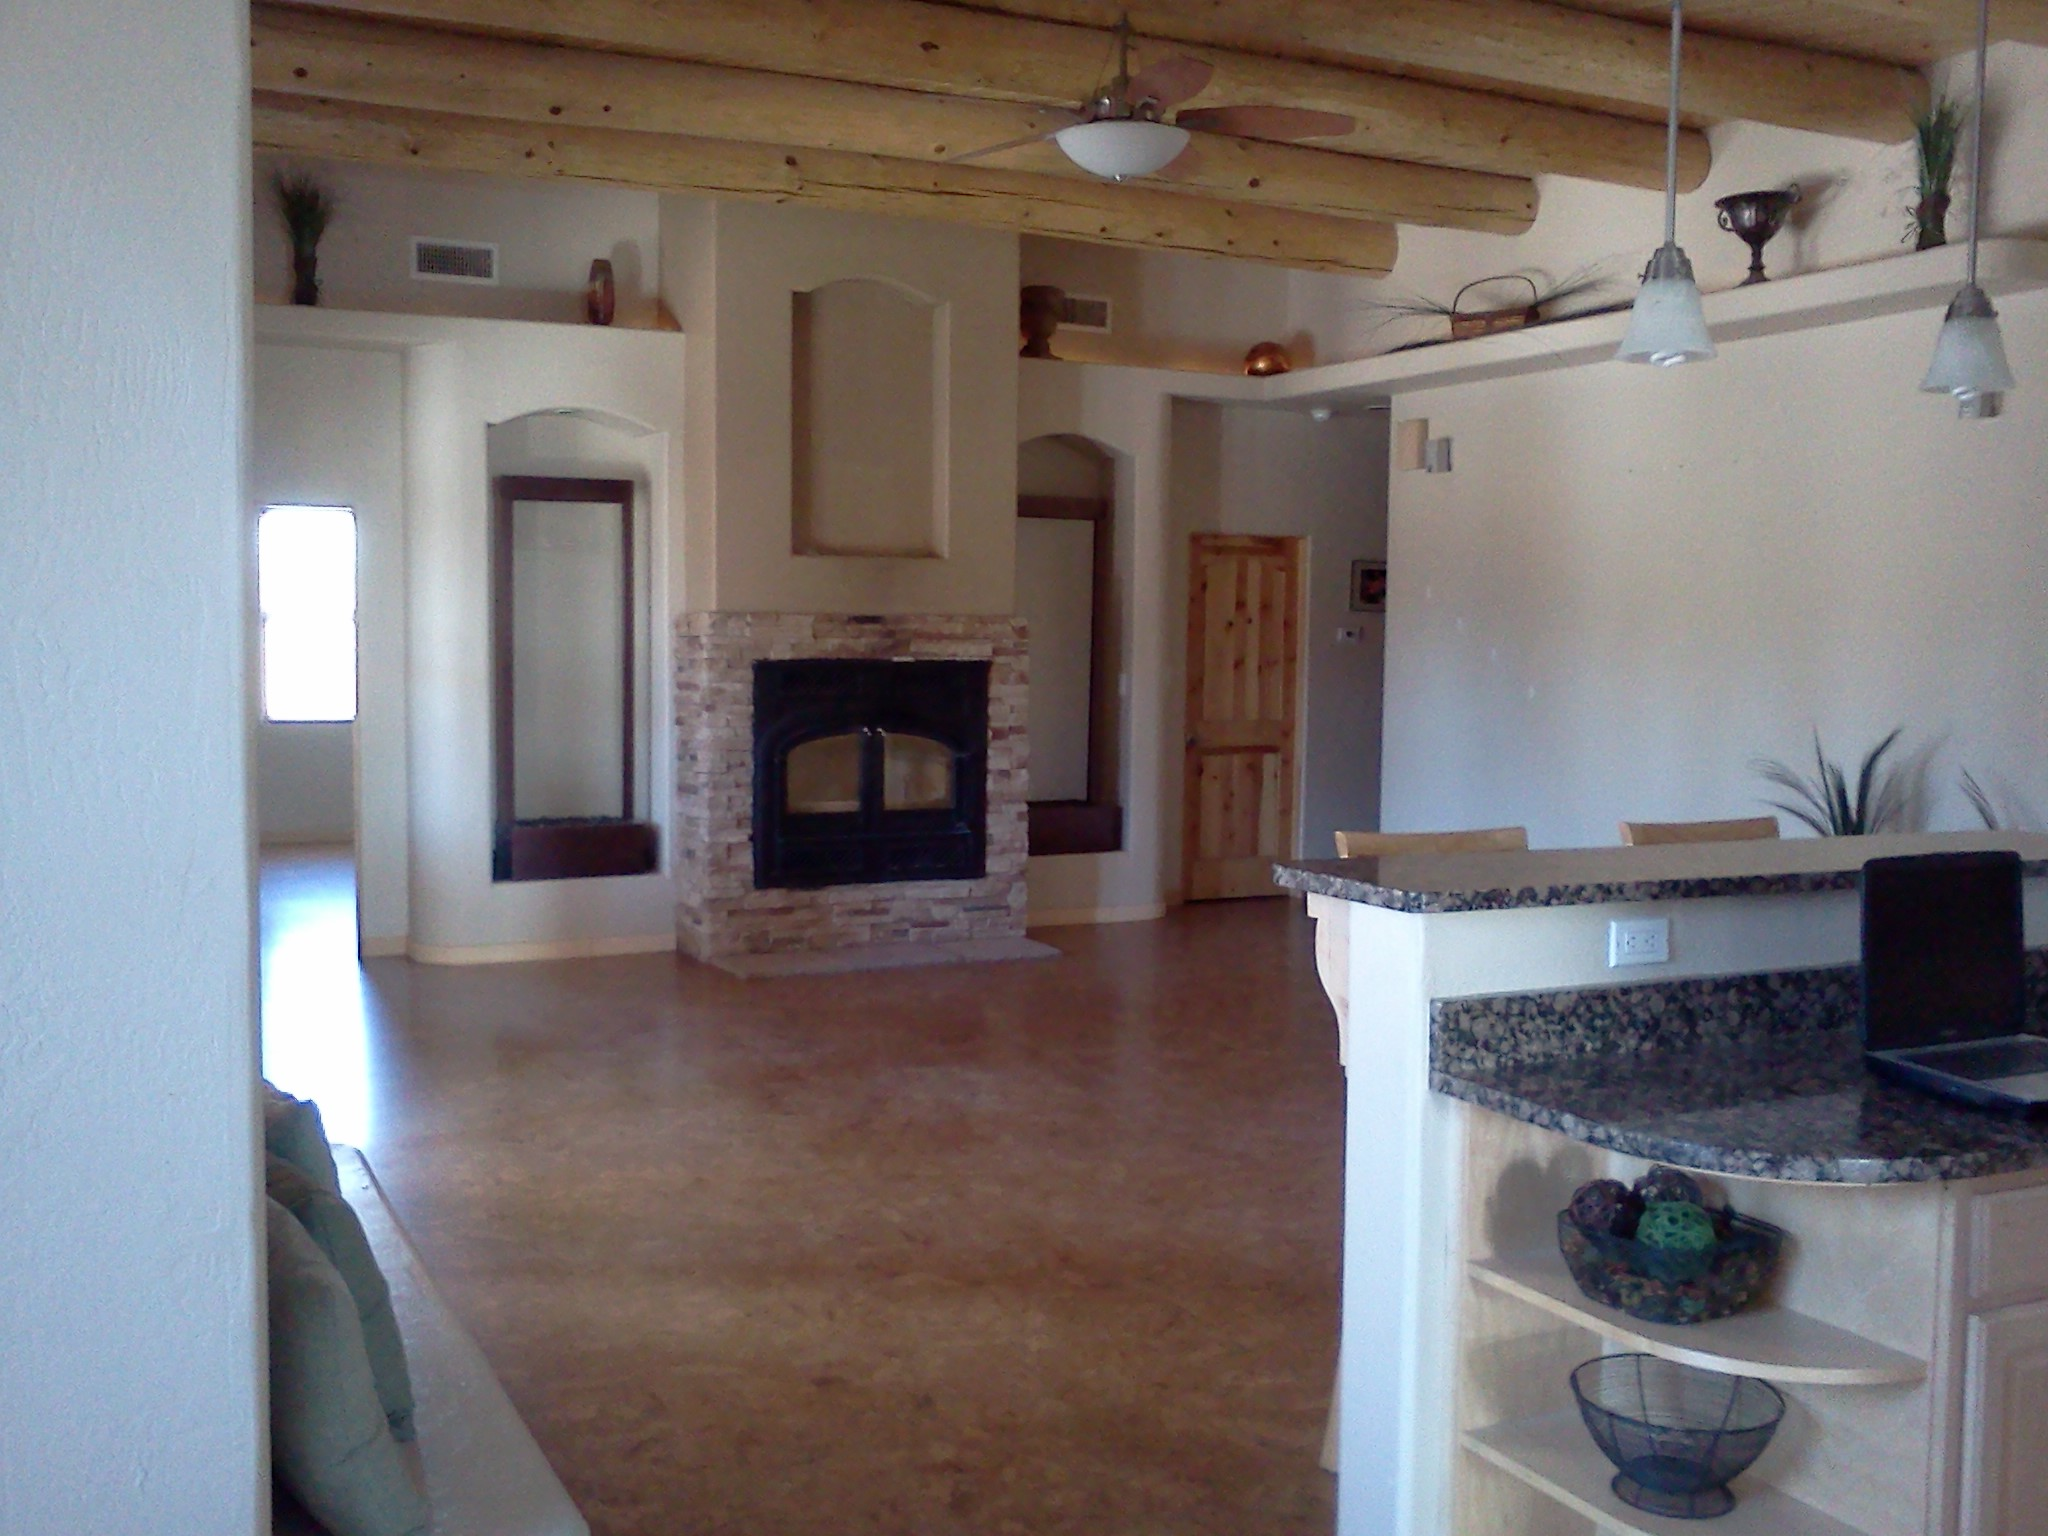 image showing flooring work